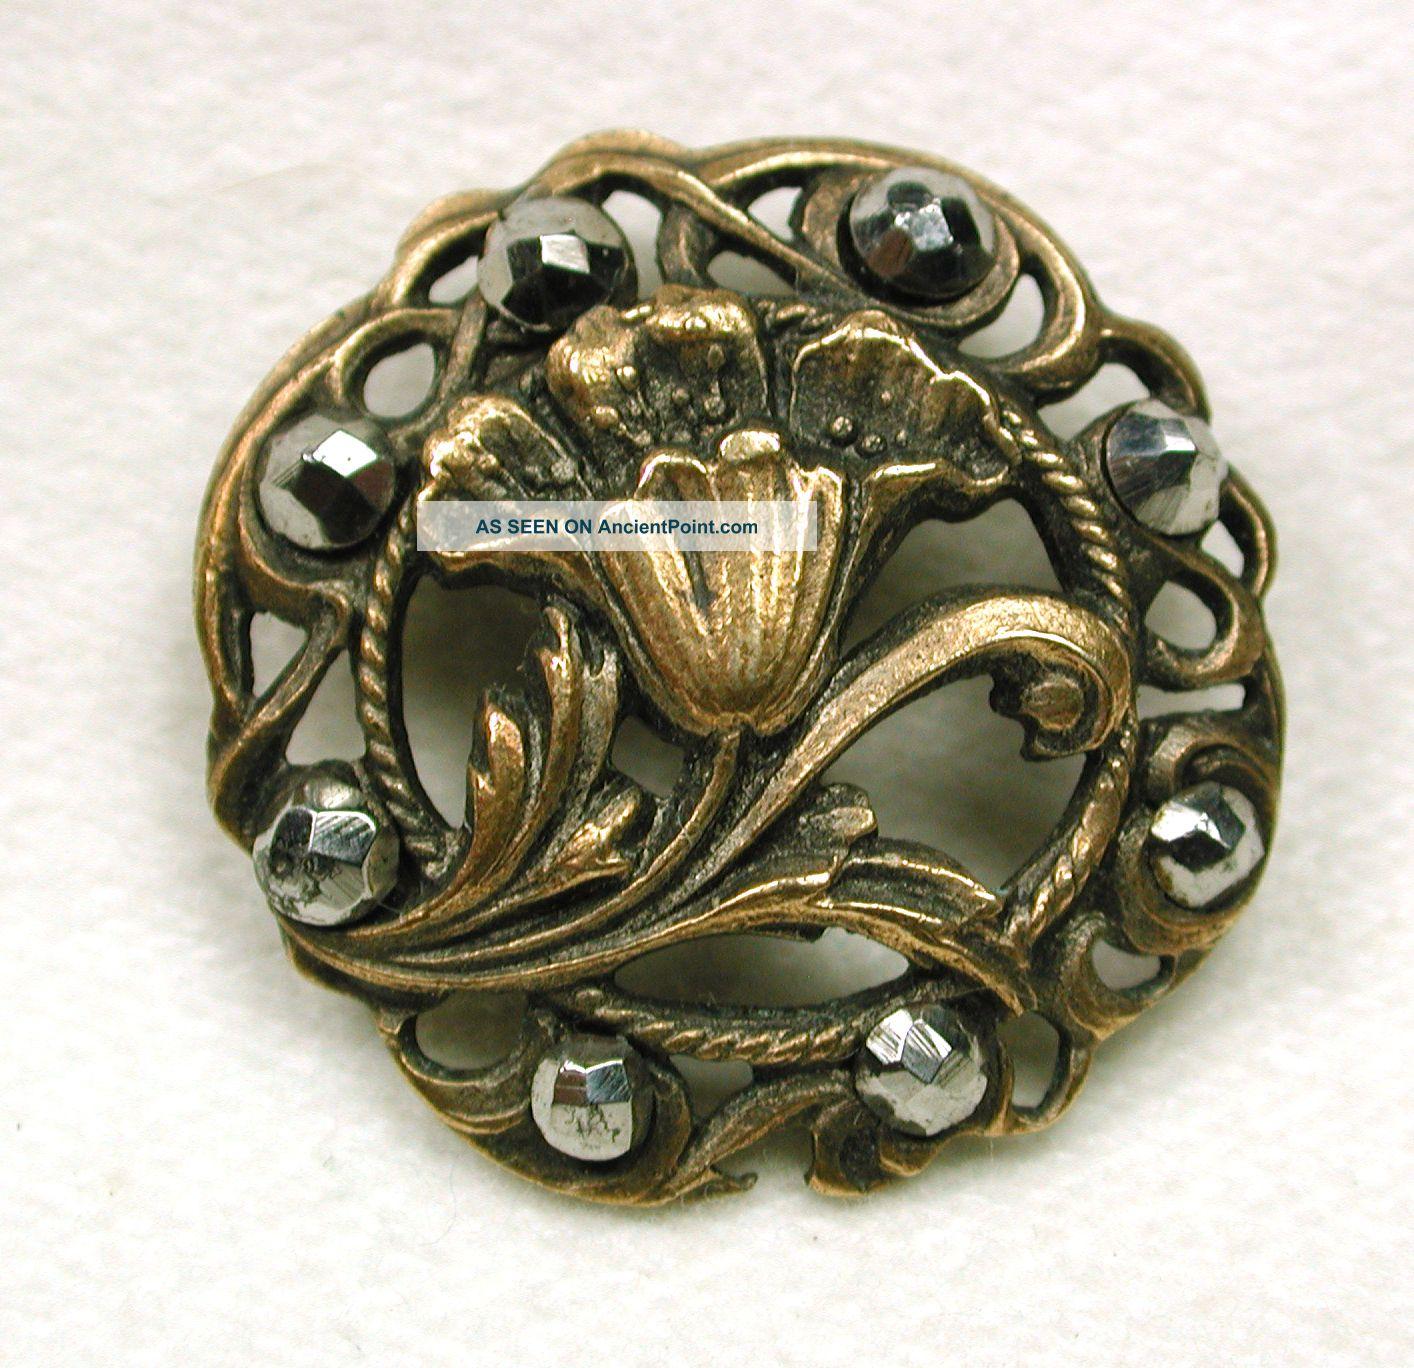 Antique Pierced Brass Button Art Nouveau Flower W/ Cut Steels Border Buttons photo